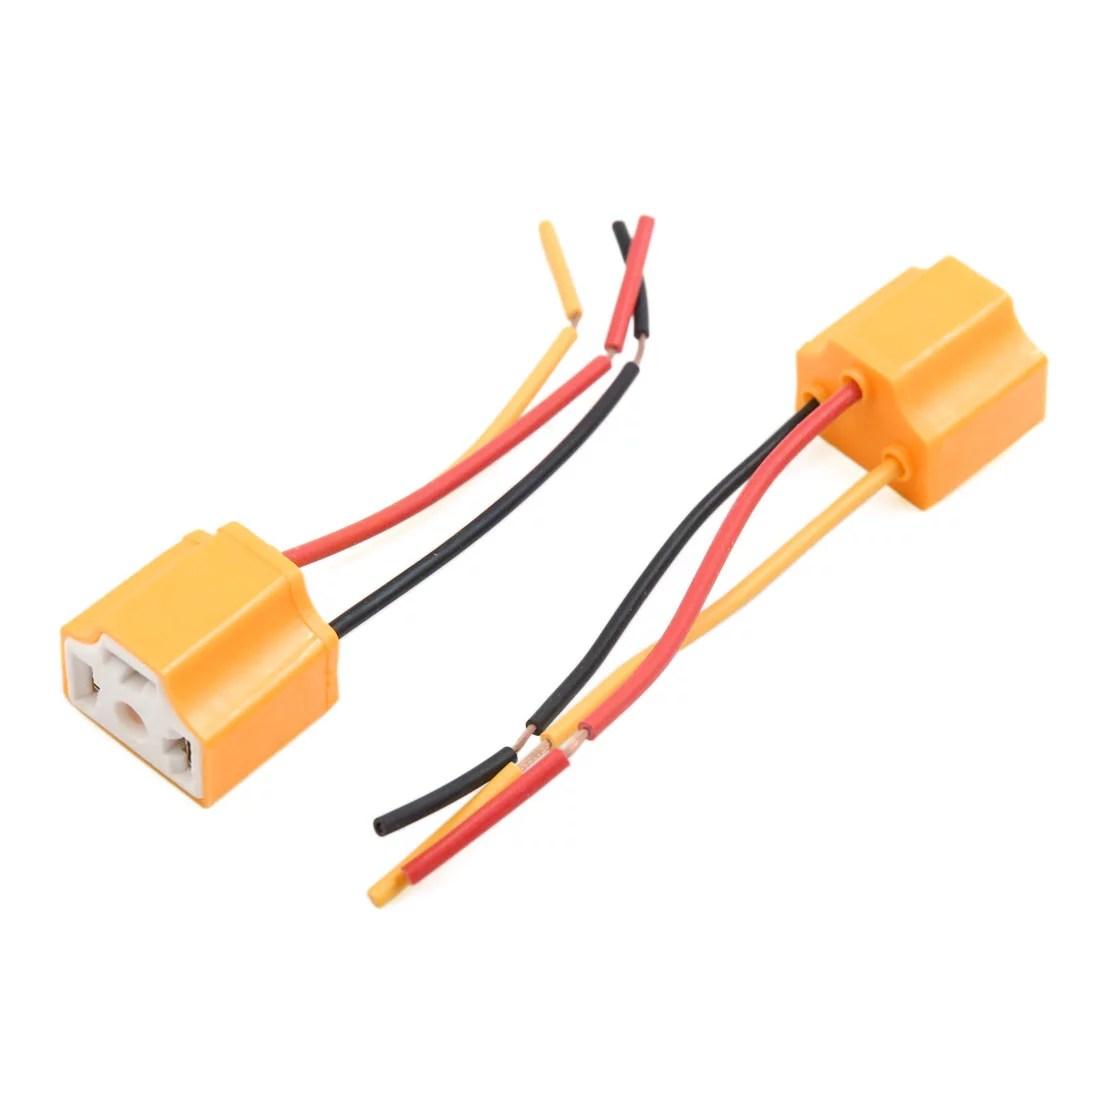 medium resolution of 10 pcs orange 3 terminals h4 bulb socket car wire harness extension